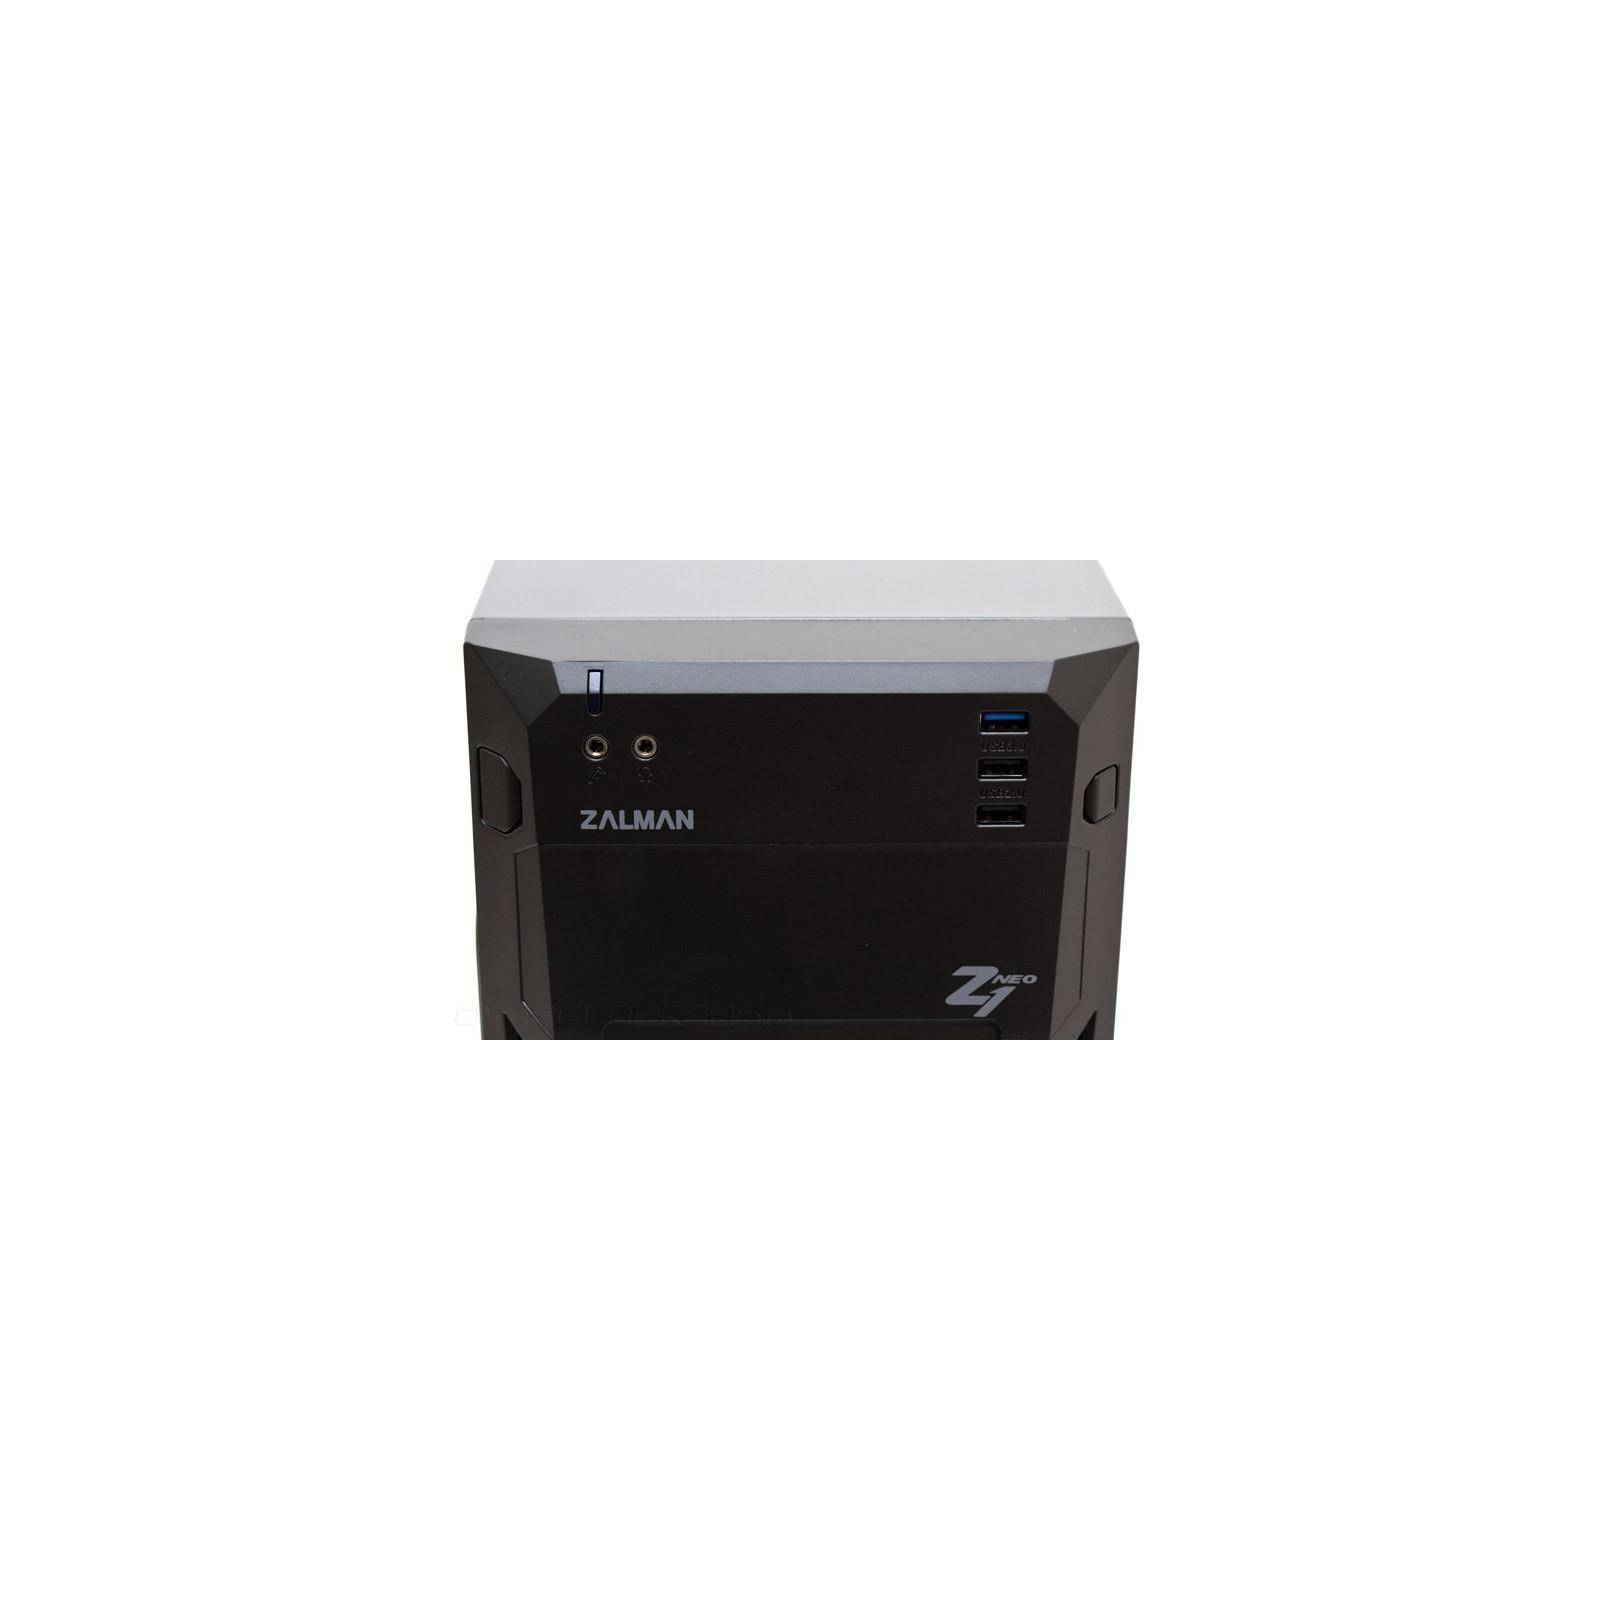 Корпус Zalman Z1 NEO изображение 8